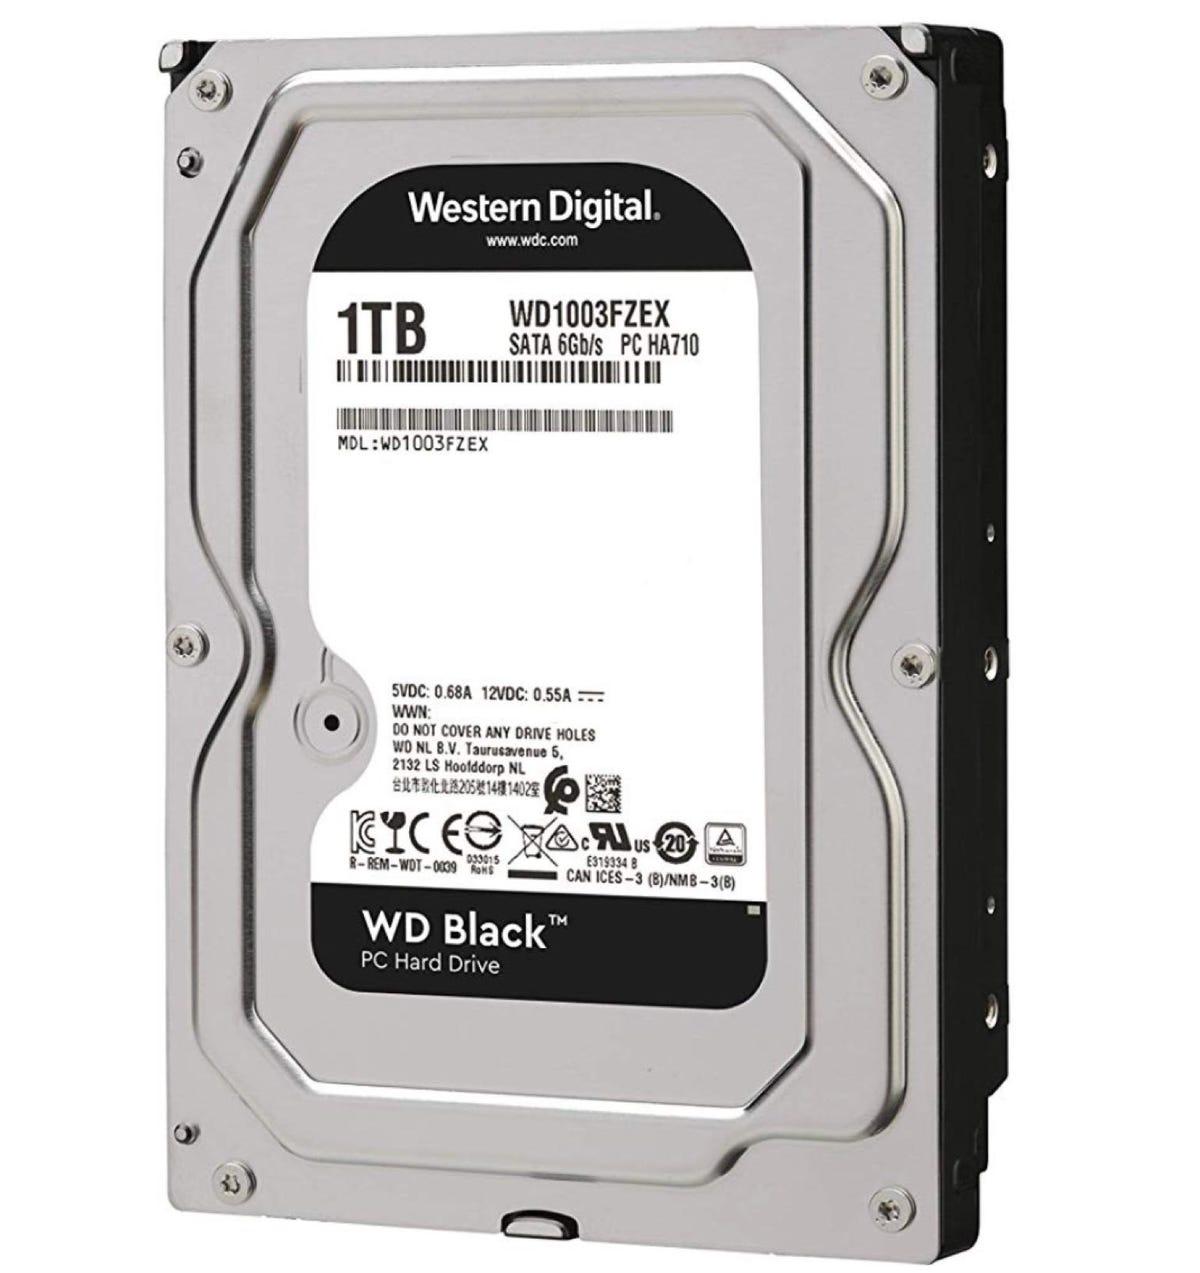 WD Black 1TB Performance Desktop Hard Disk